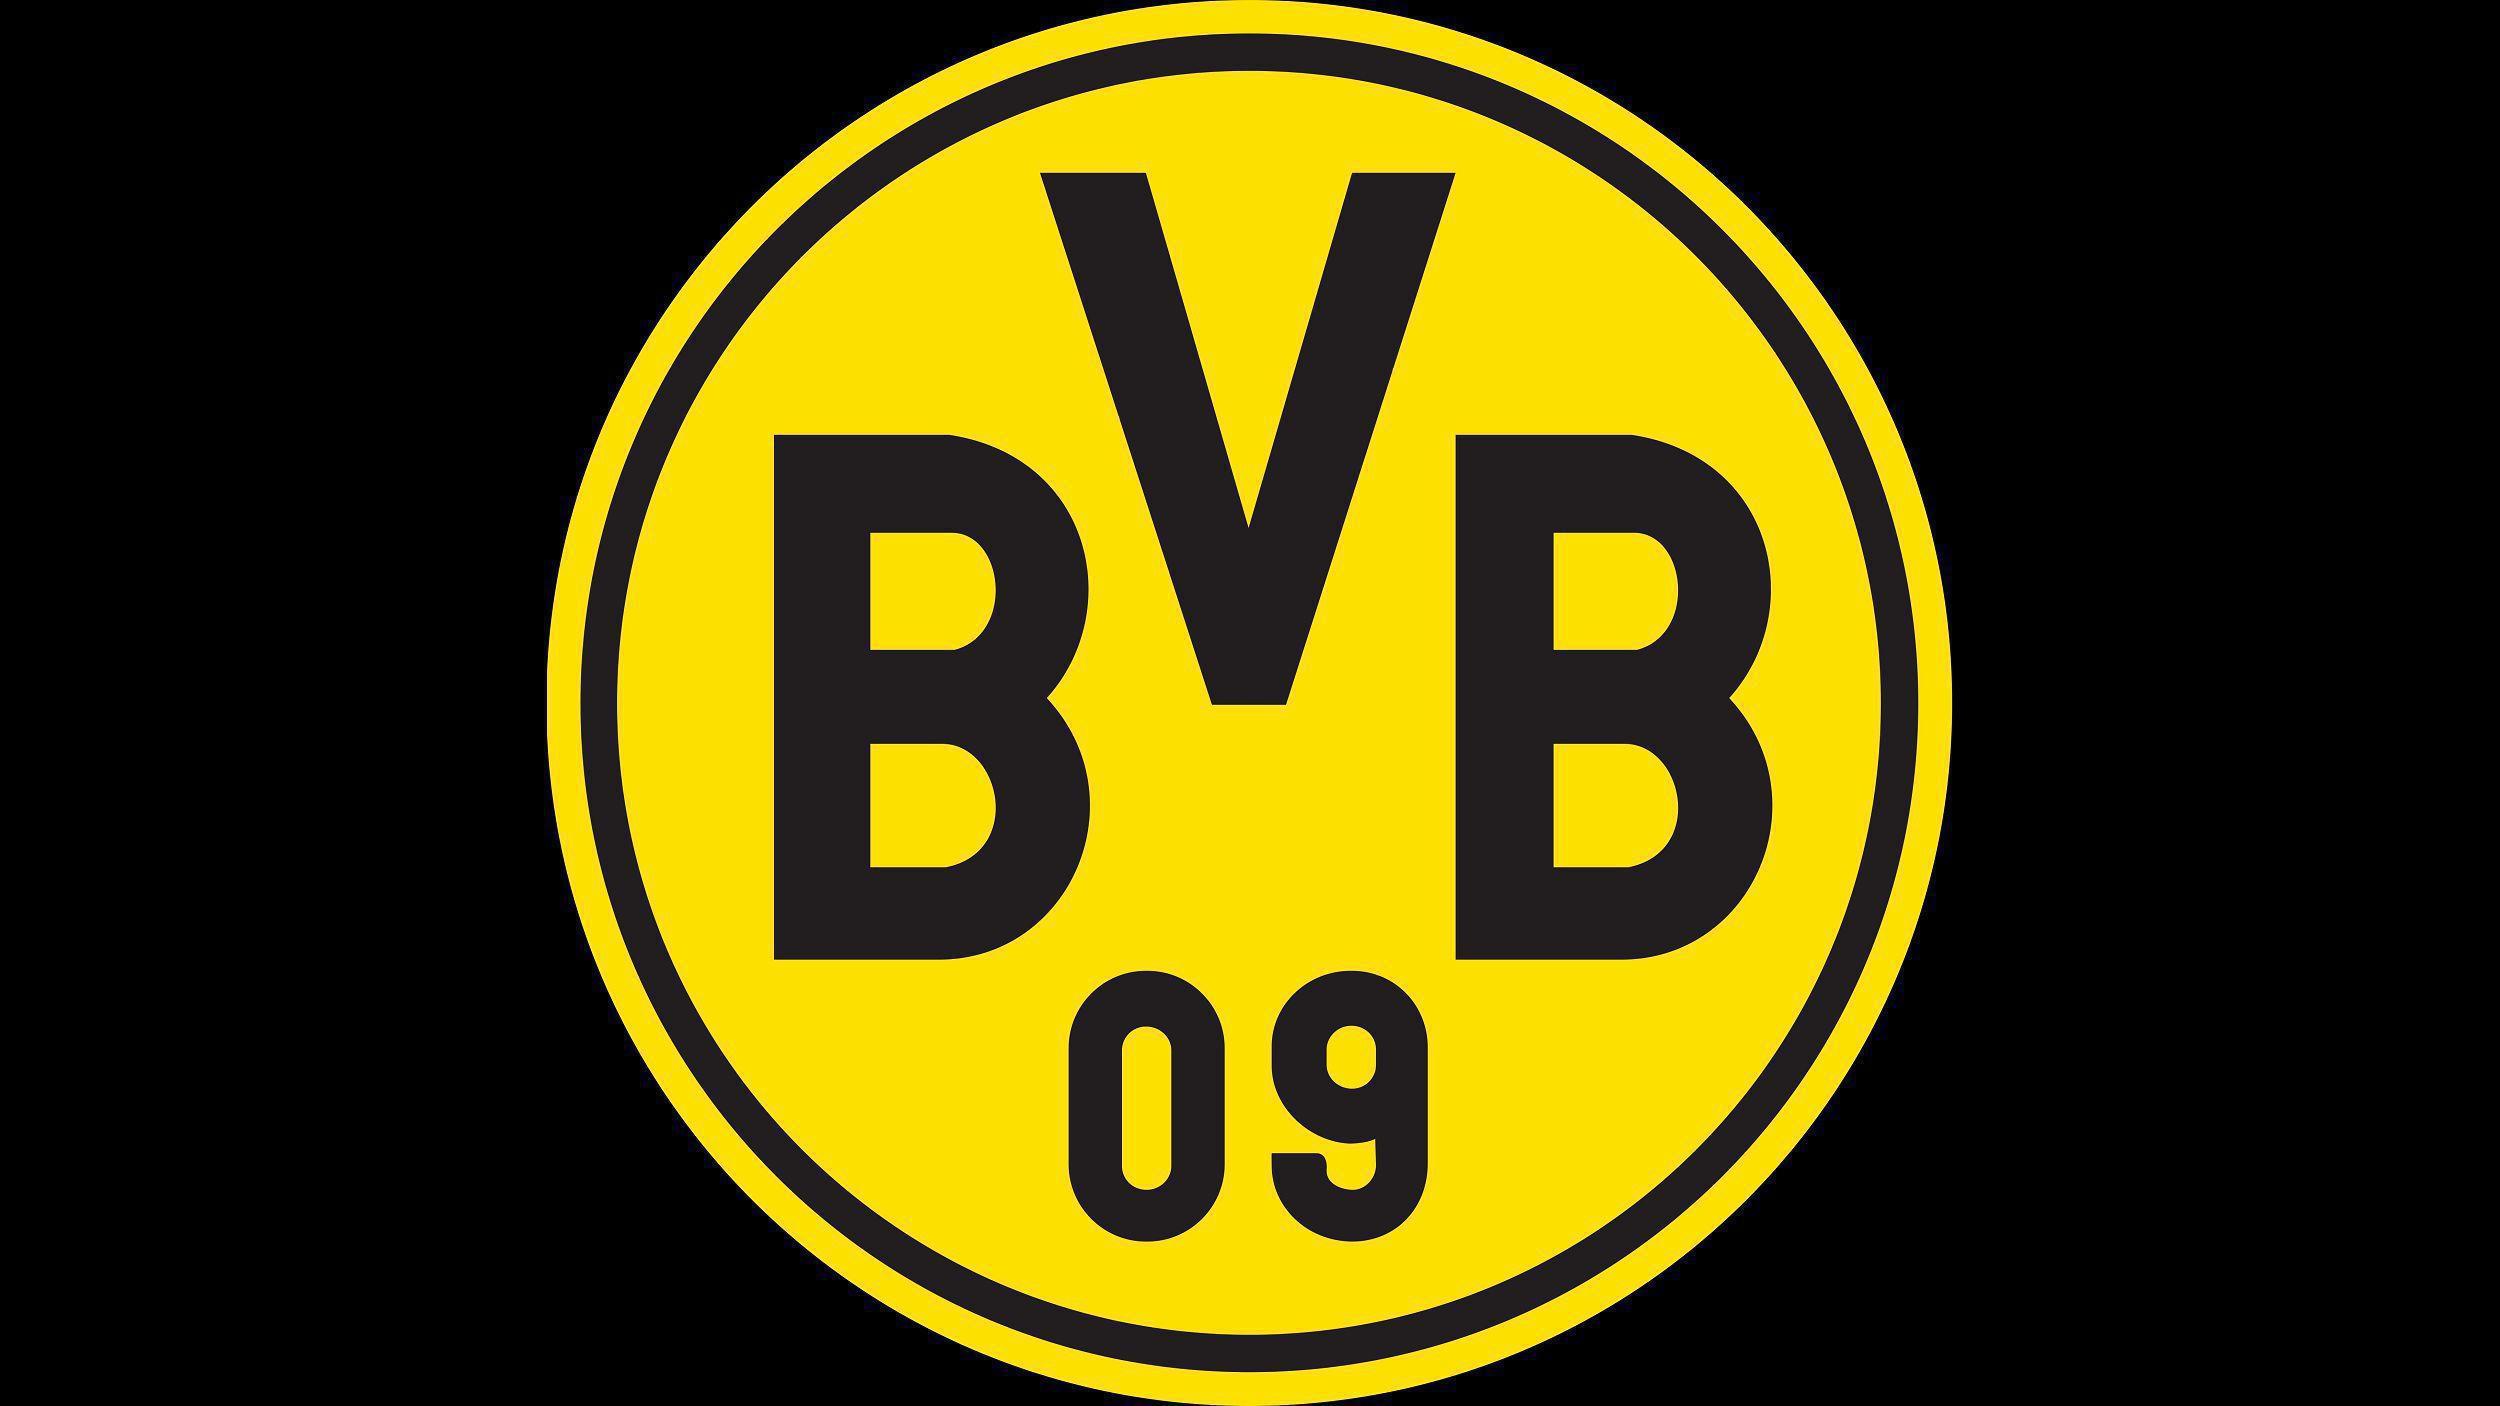 Dortmund Wallpapers Top Free Dortmund Backgrounds Wallpaperaccess